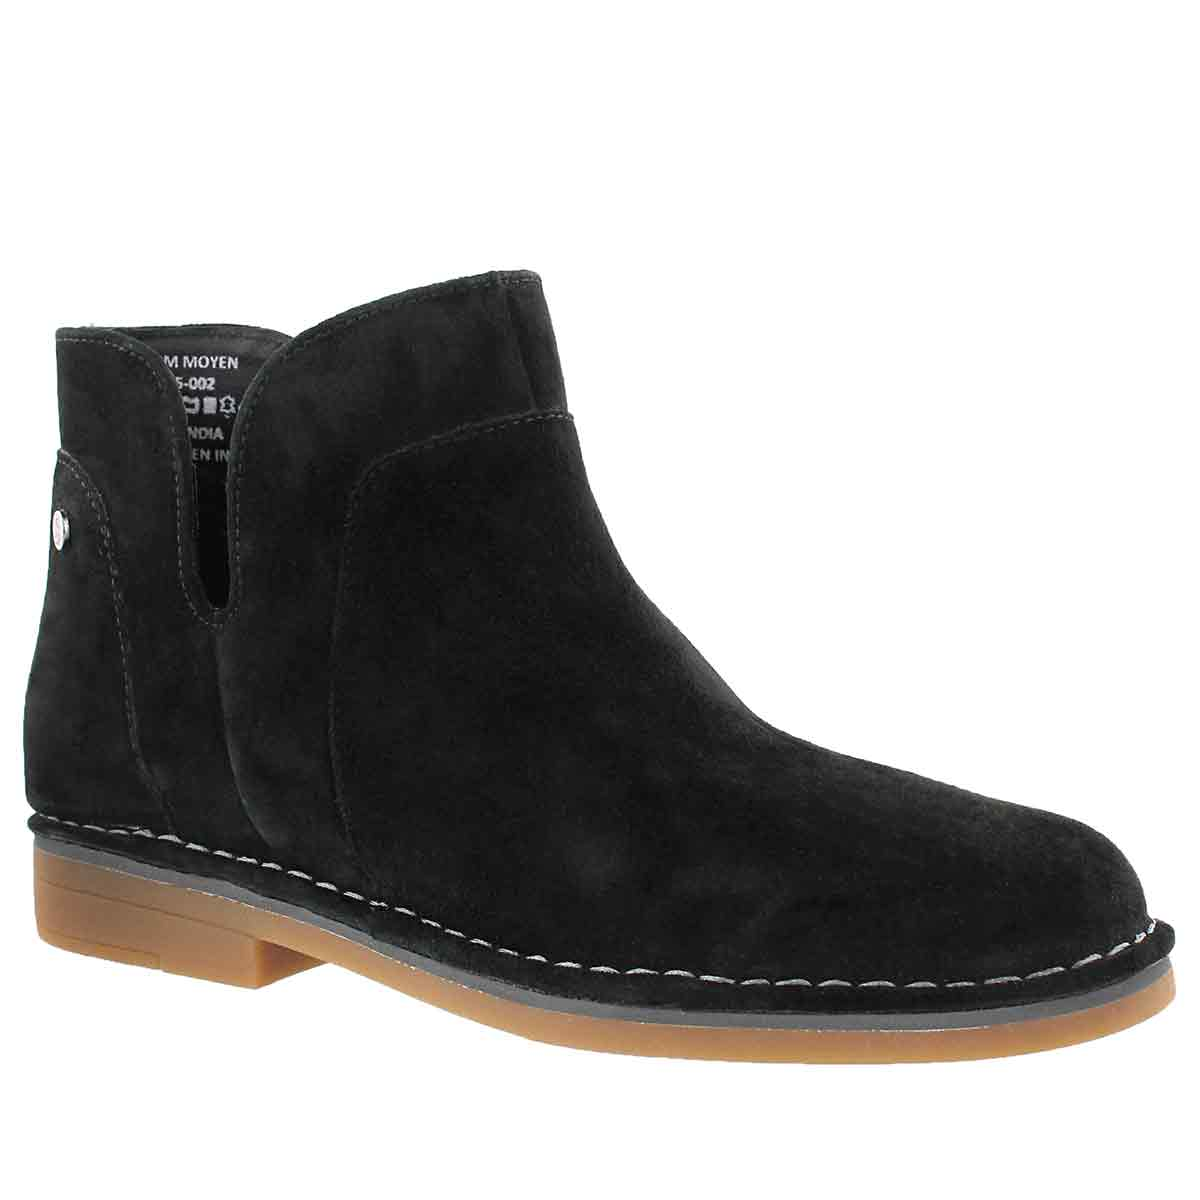 Women's CLAUDIA CATELYN black slip on boots